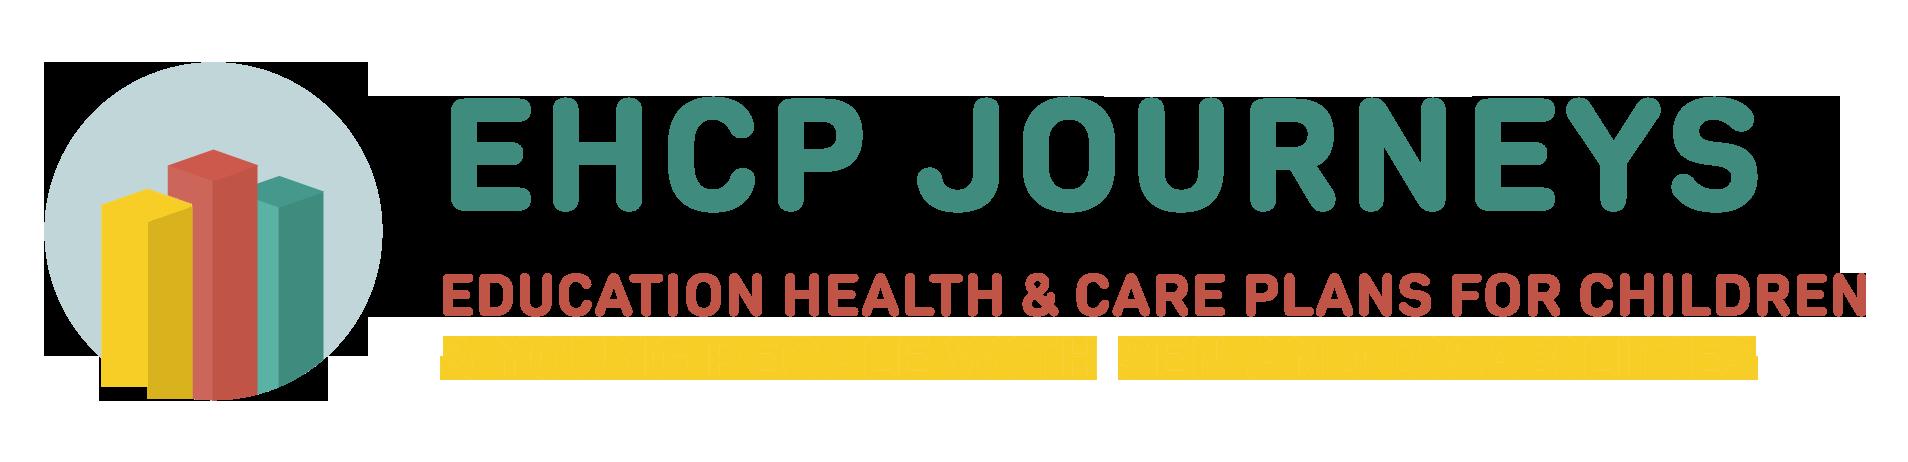 EHCP Journeys